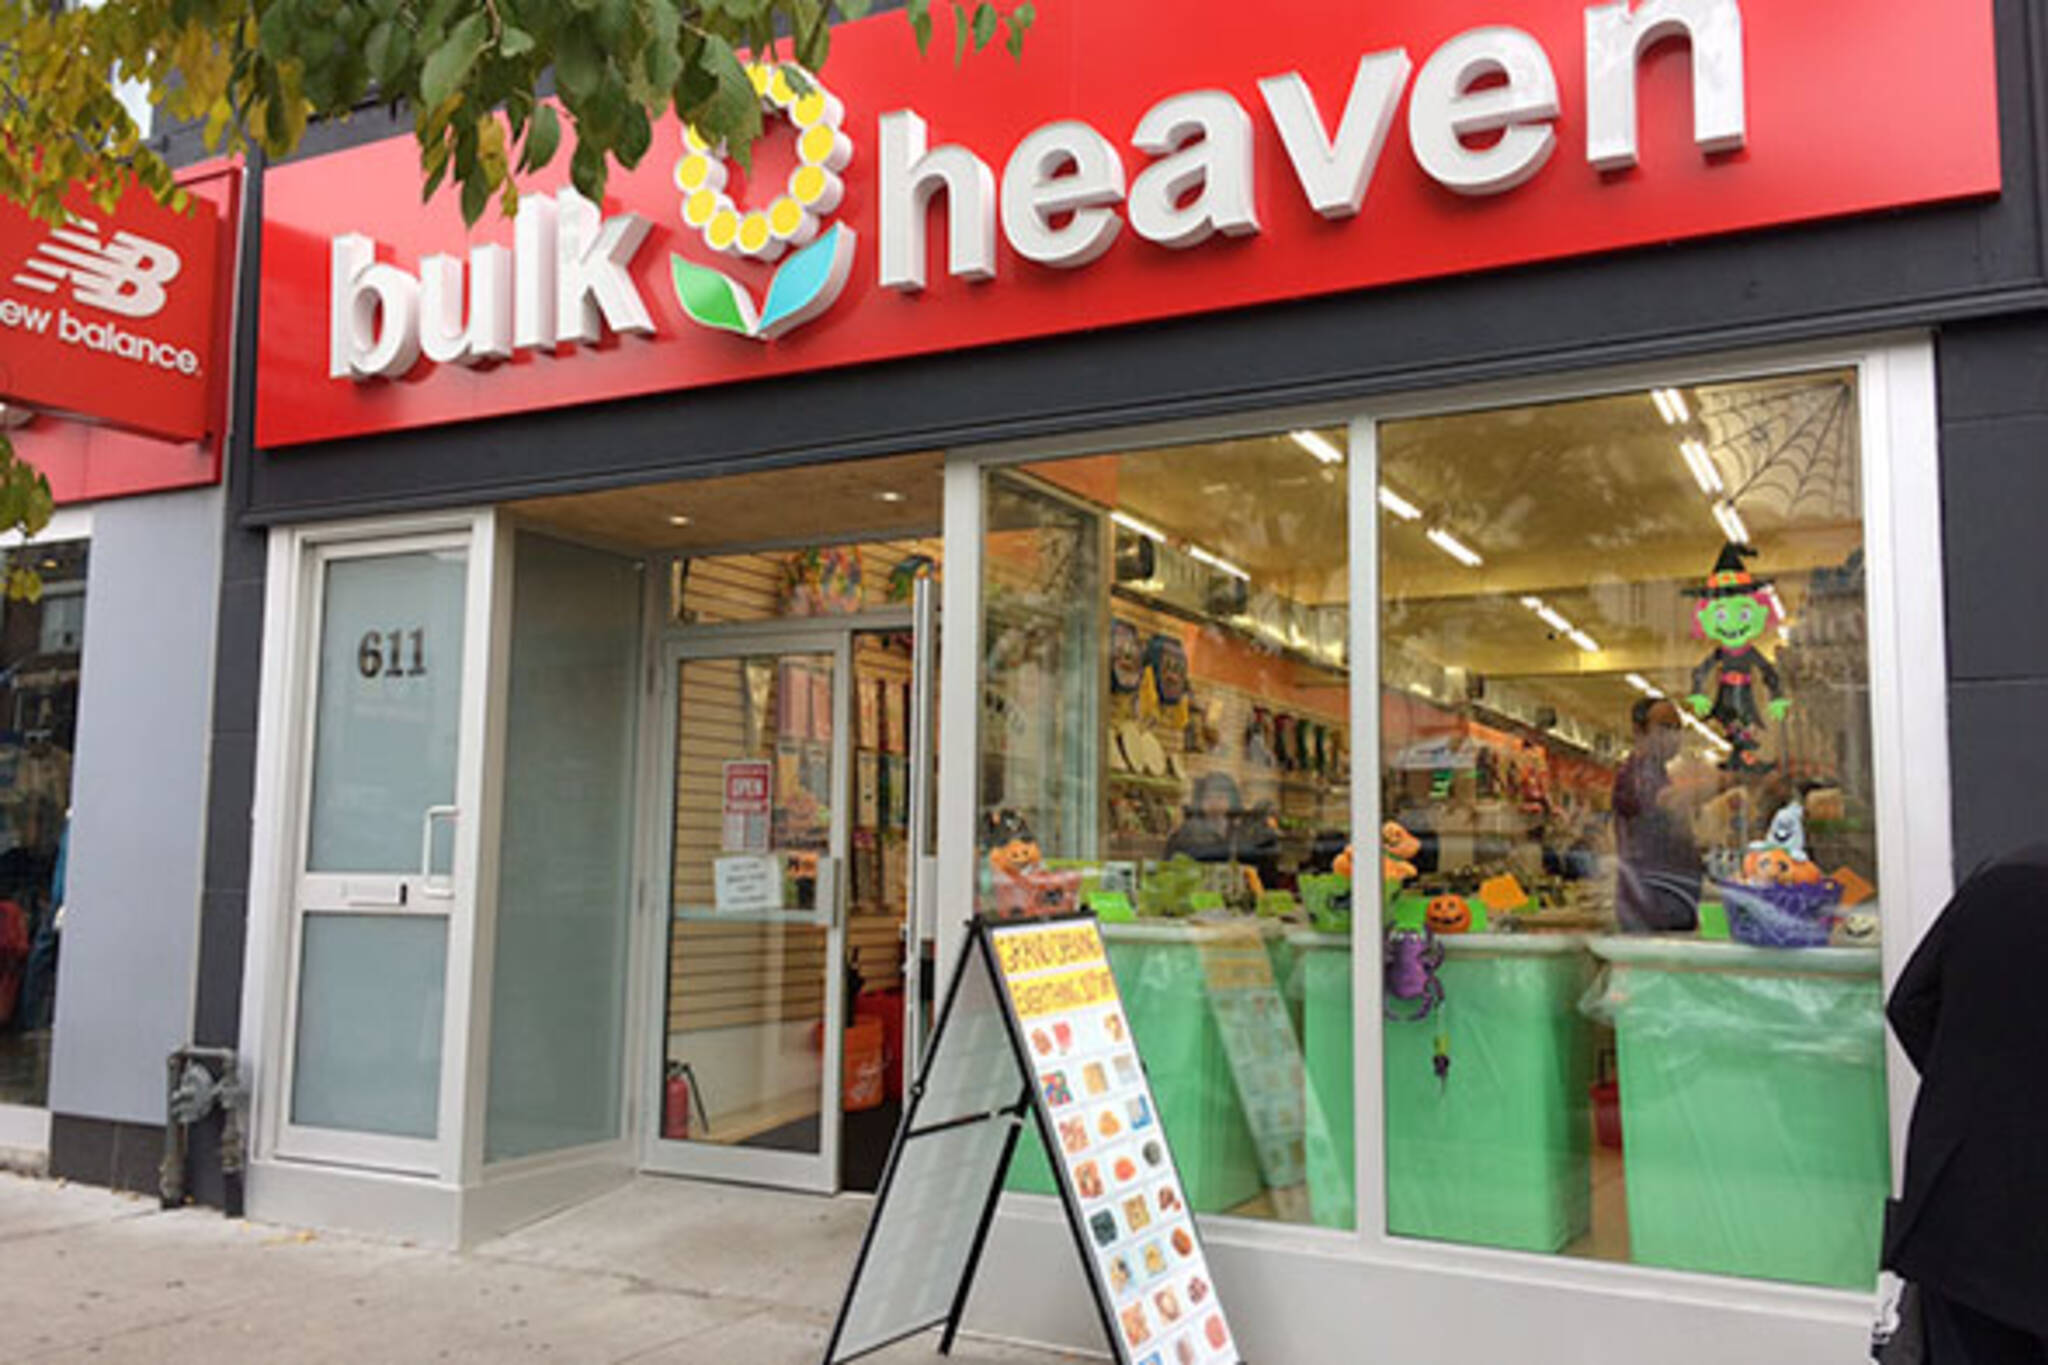 Bulk Heaven Danforth Toronto